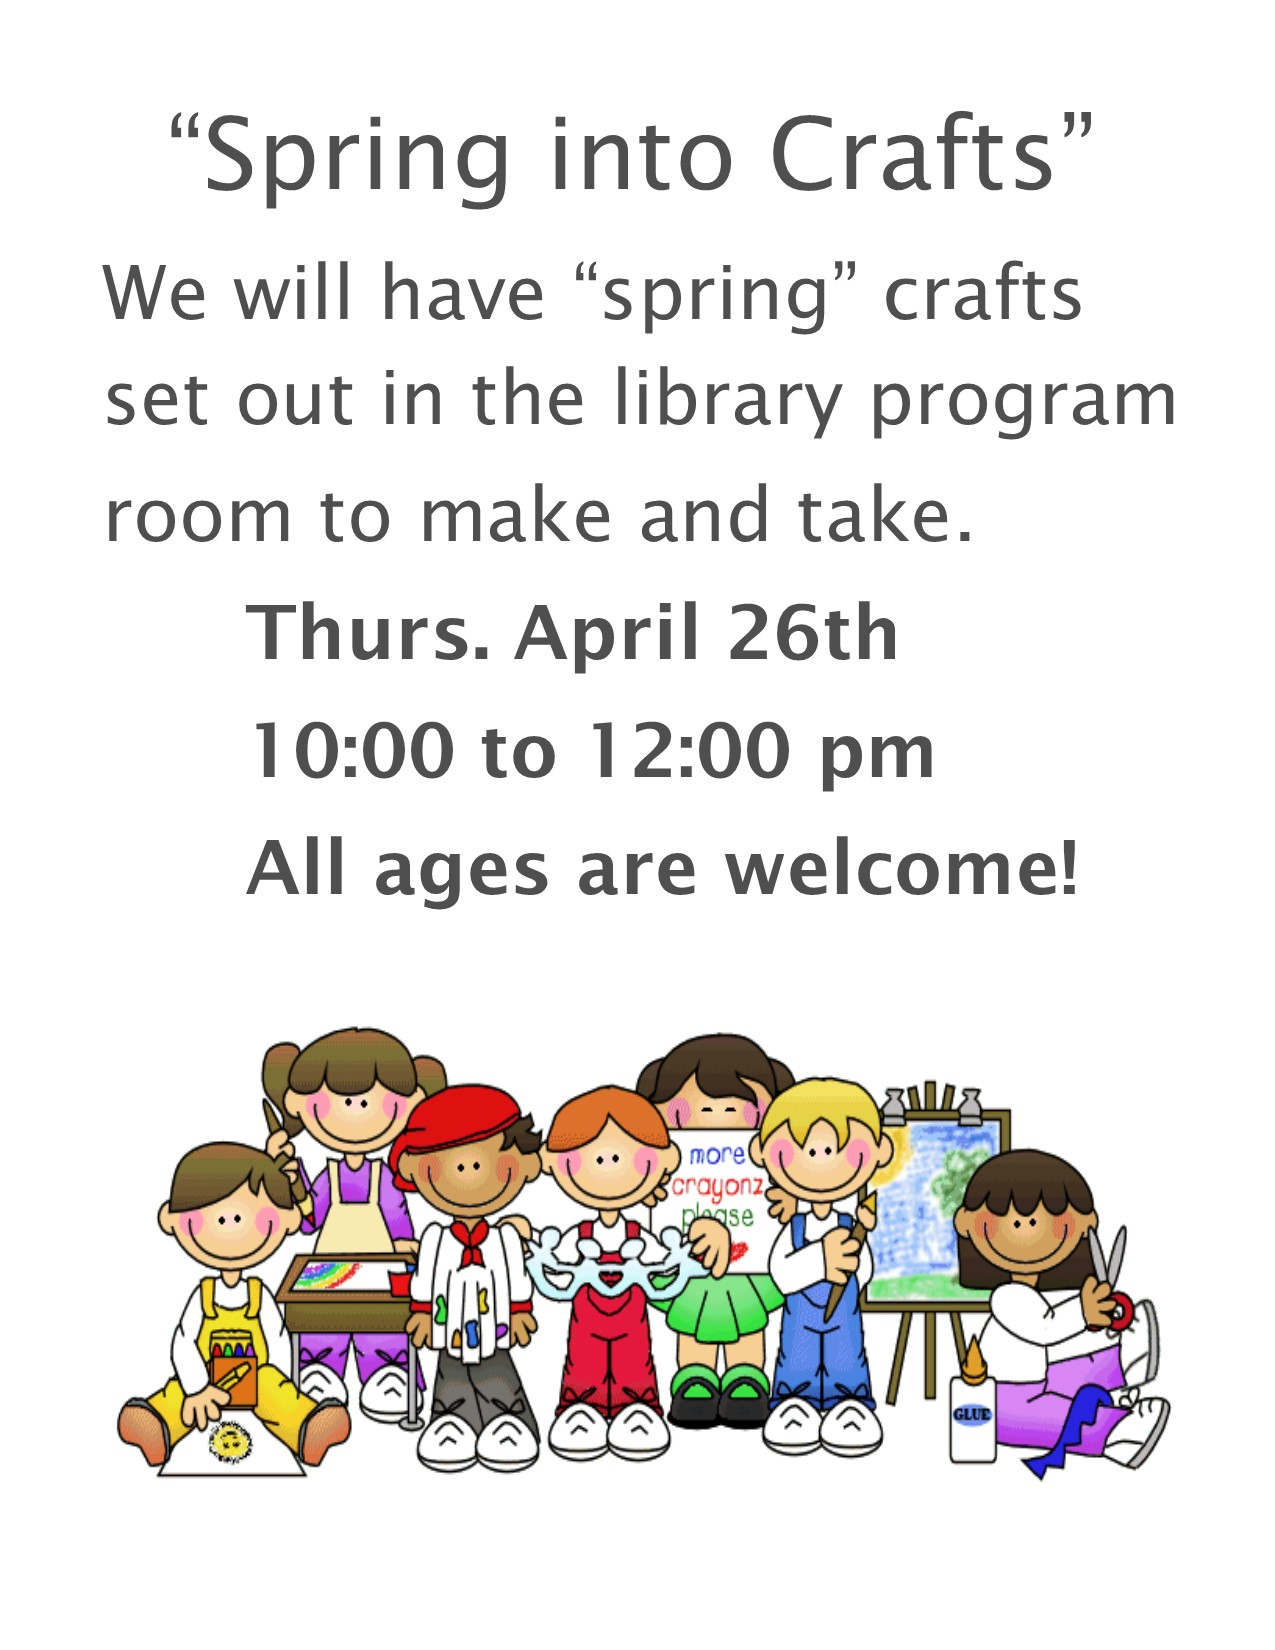 Spring into Crafts 0418.jpg